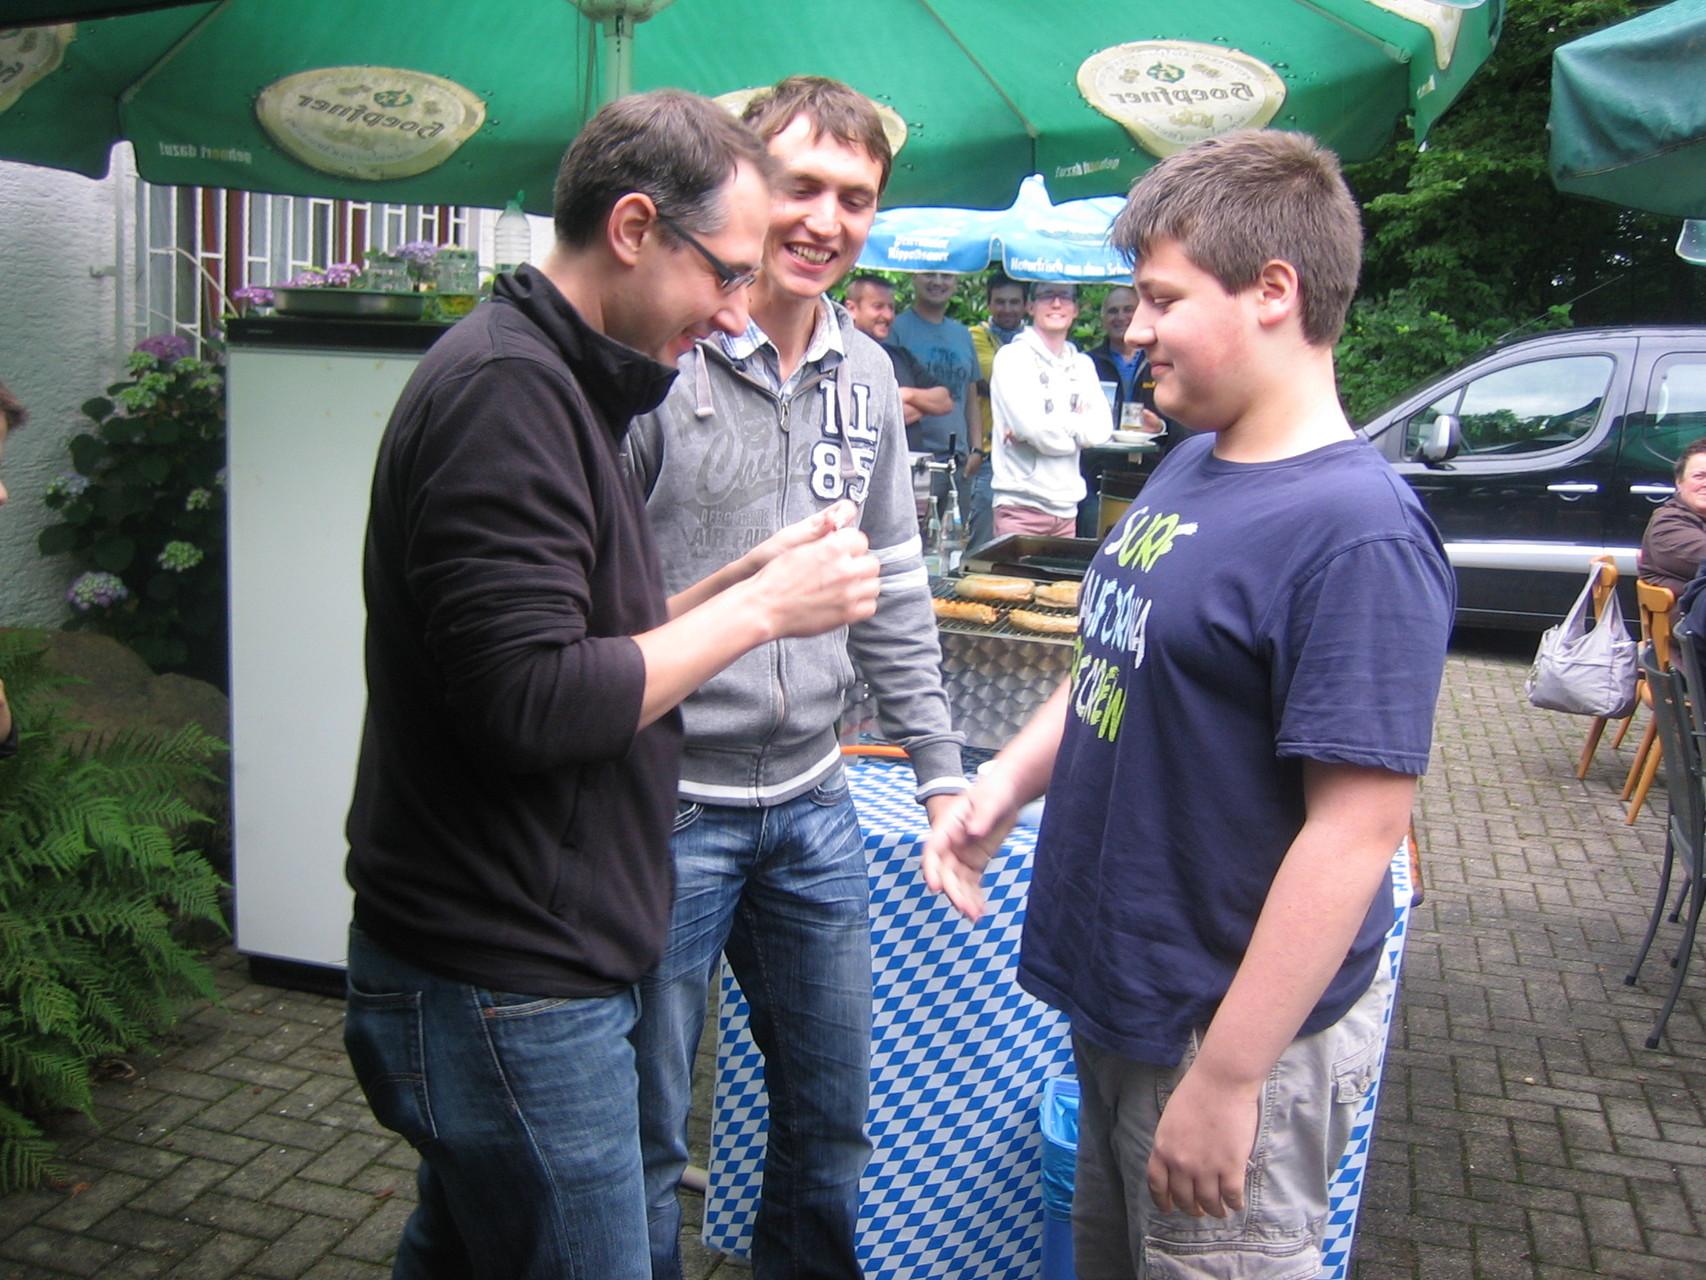 Proklamation der Königsfamilie: 1. Jugendritter Dustin Huck